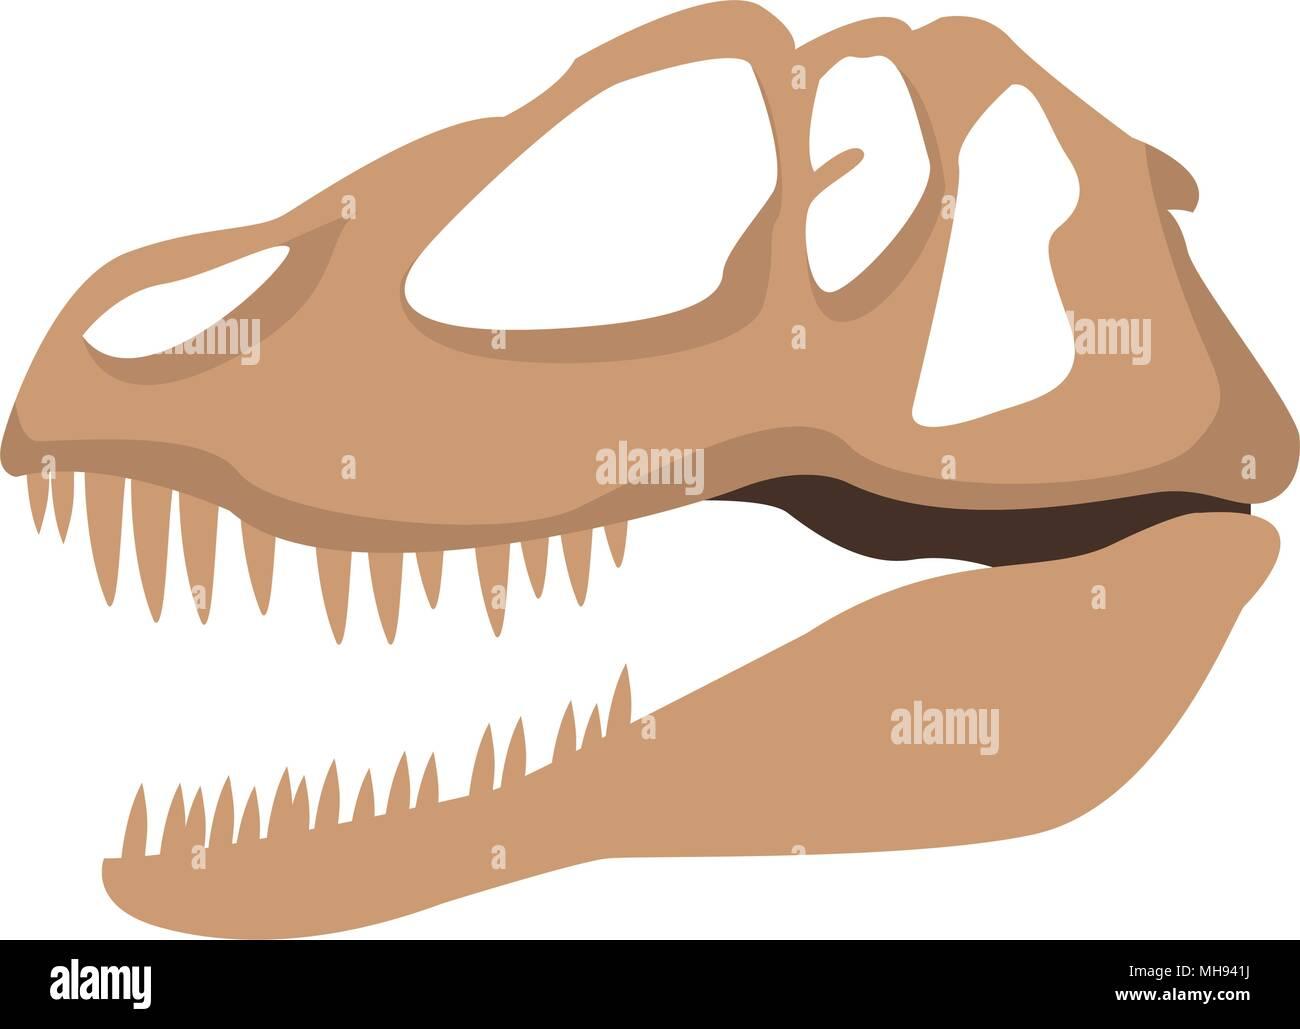 Dinosaur skull isolated - Stock Image